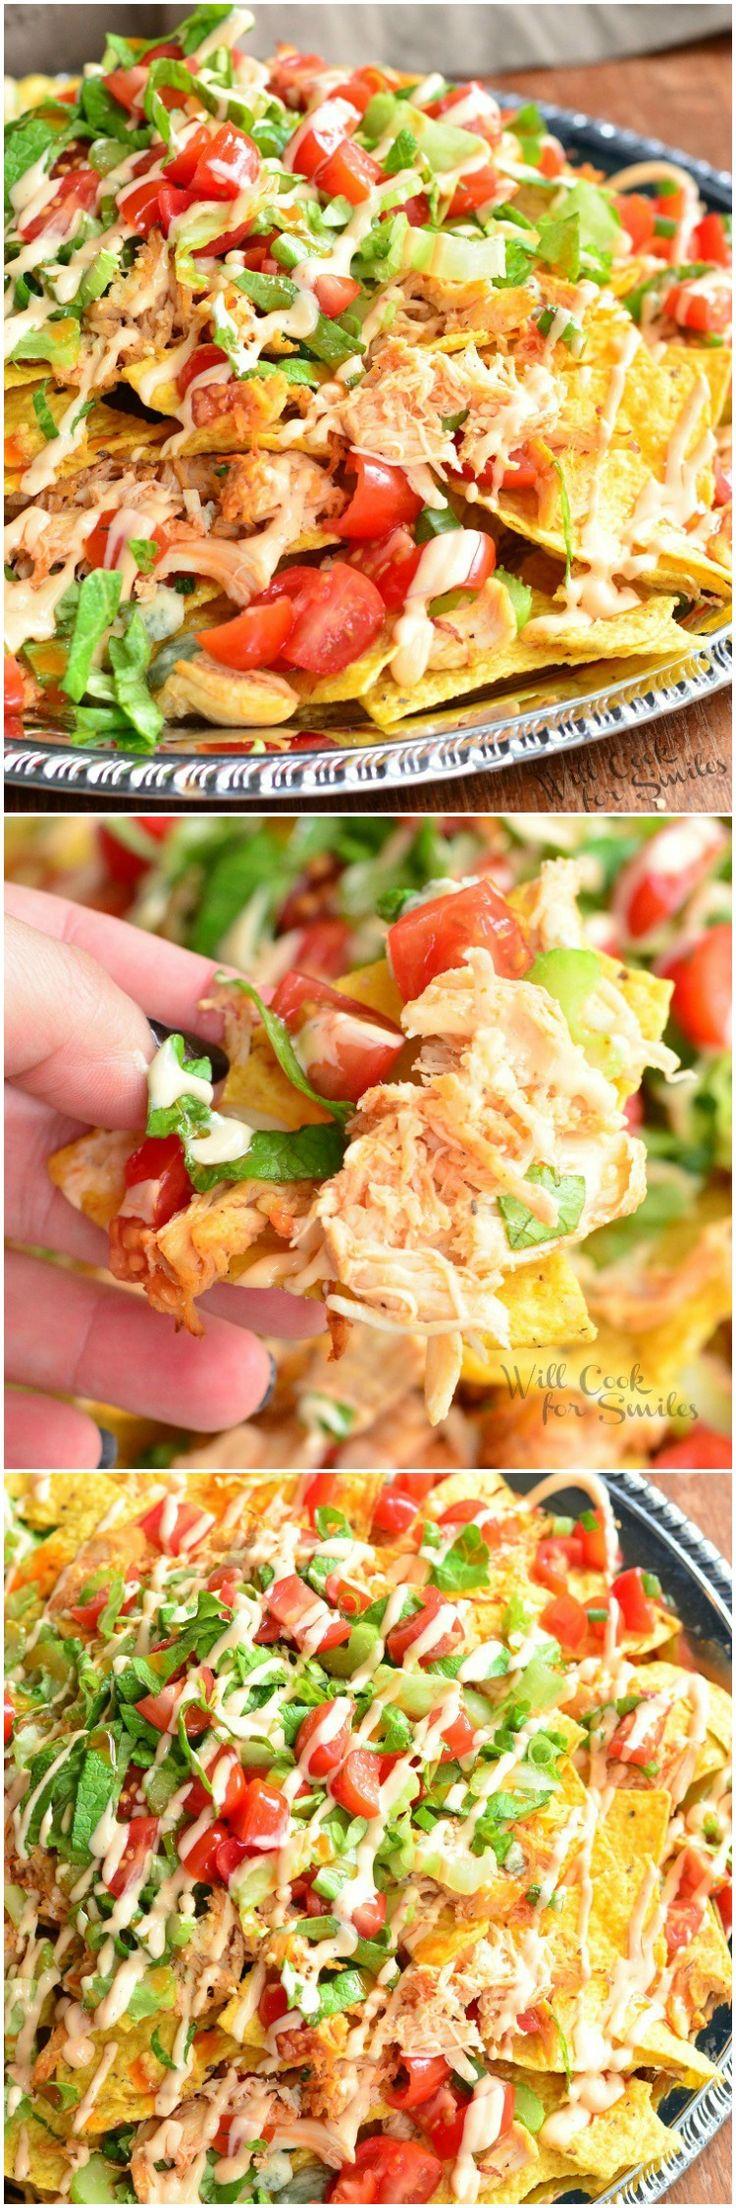 Buffalo Chicken Nachos | from willcookforsmiles.com #appertizer #snack